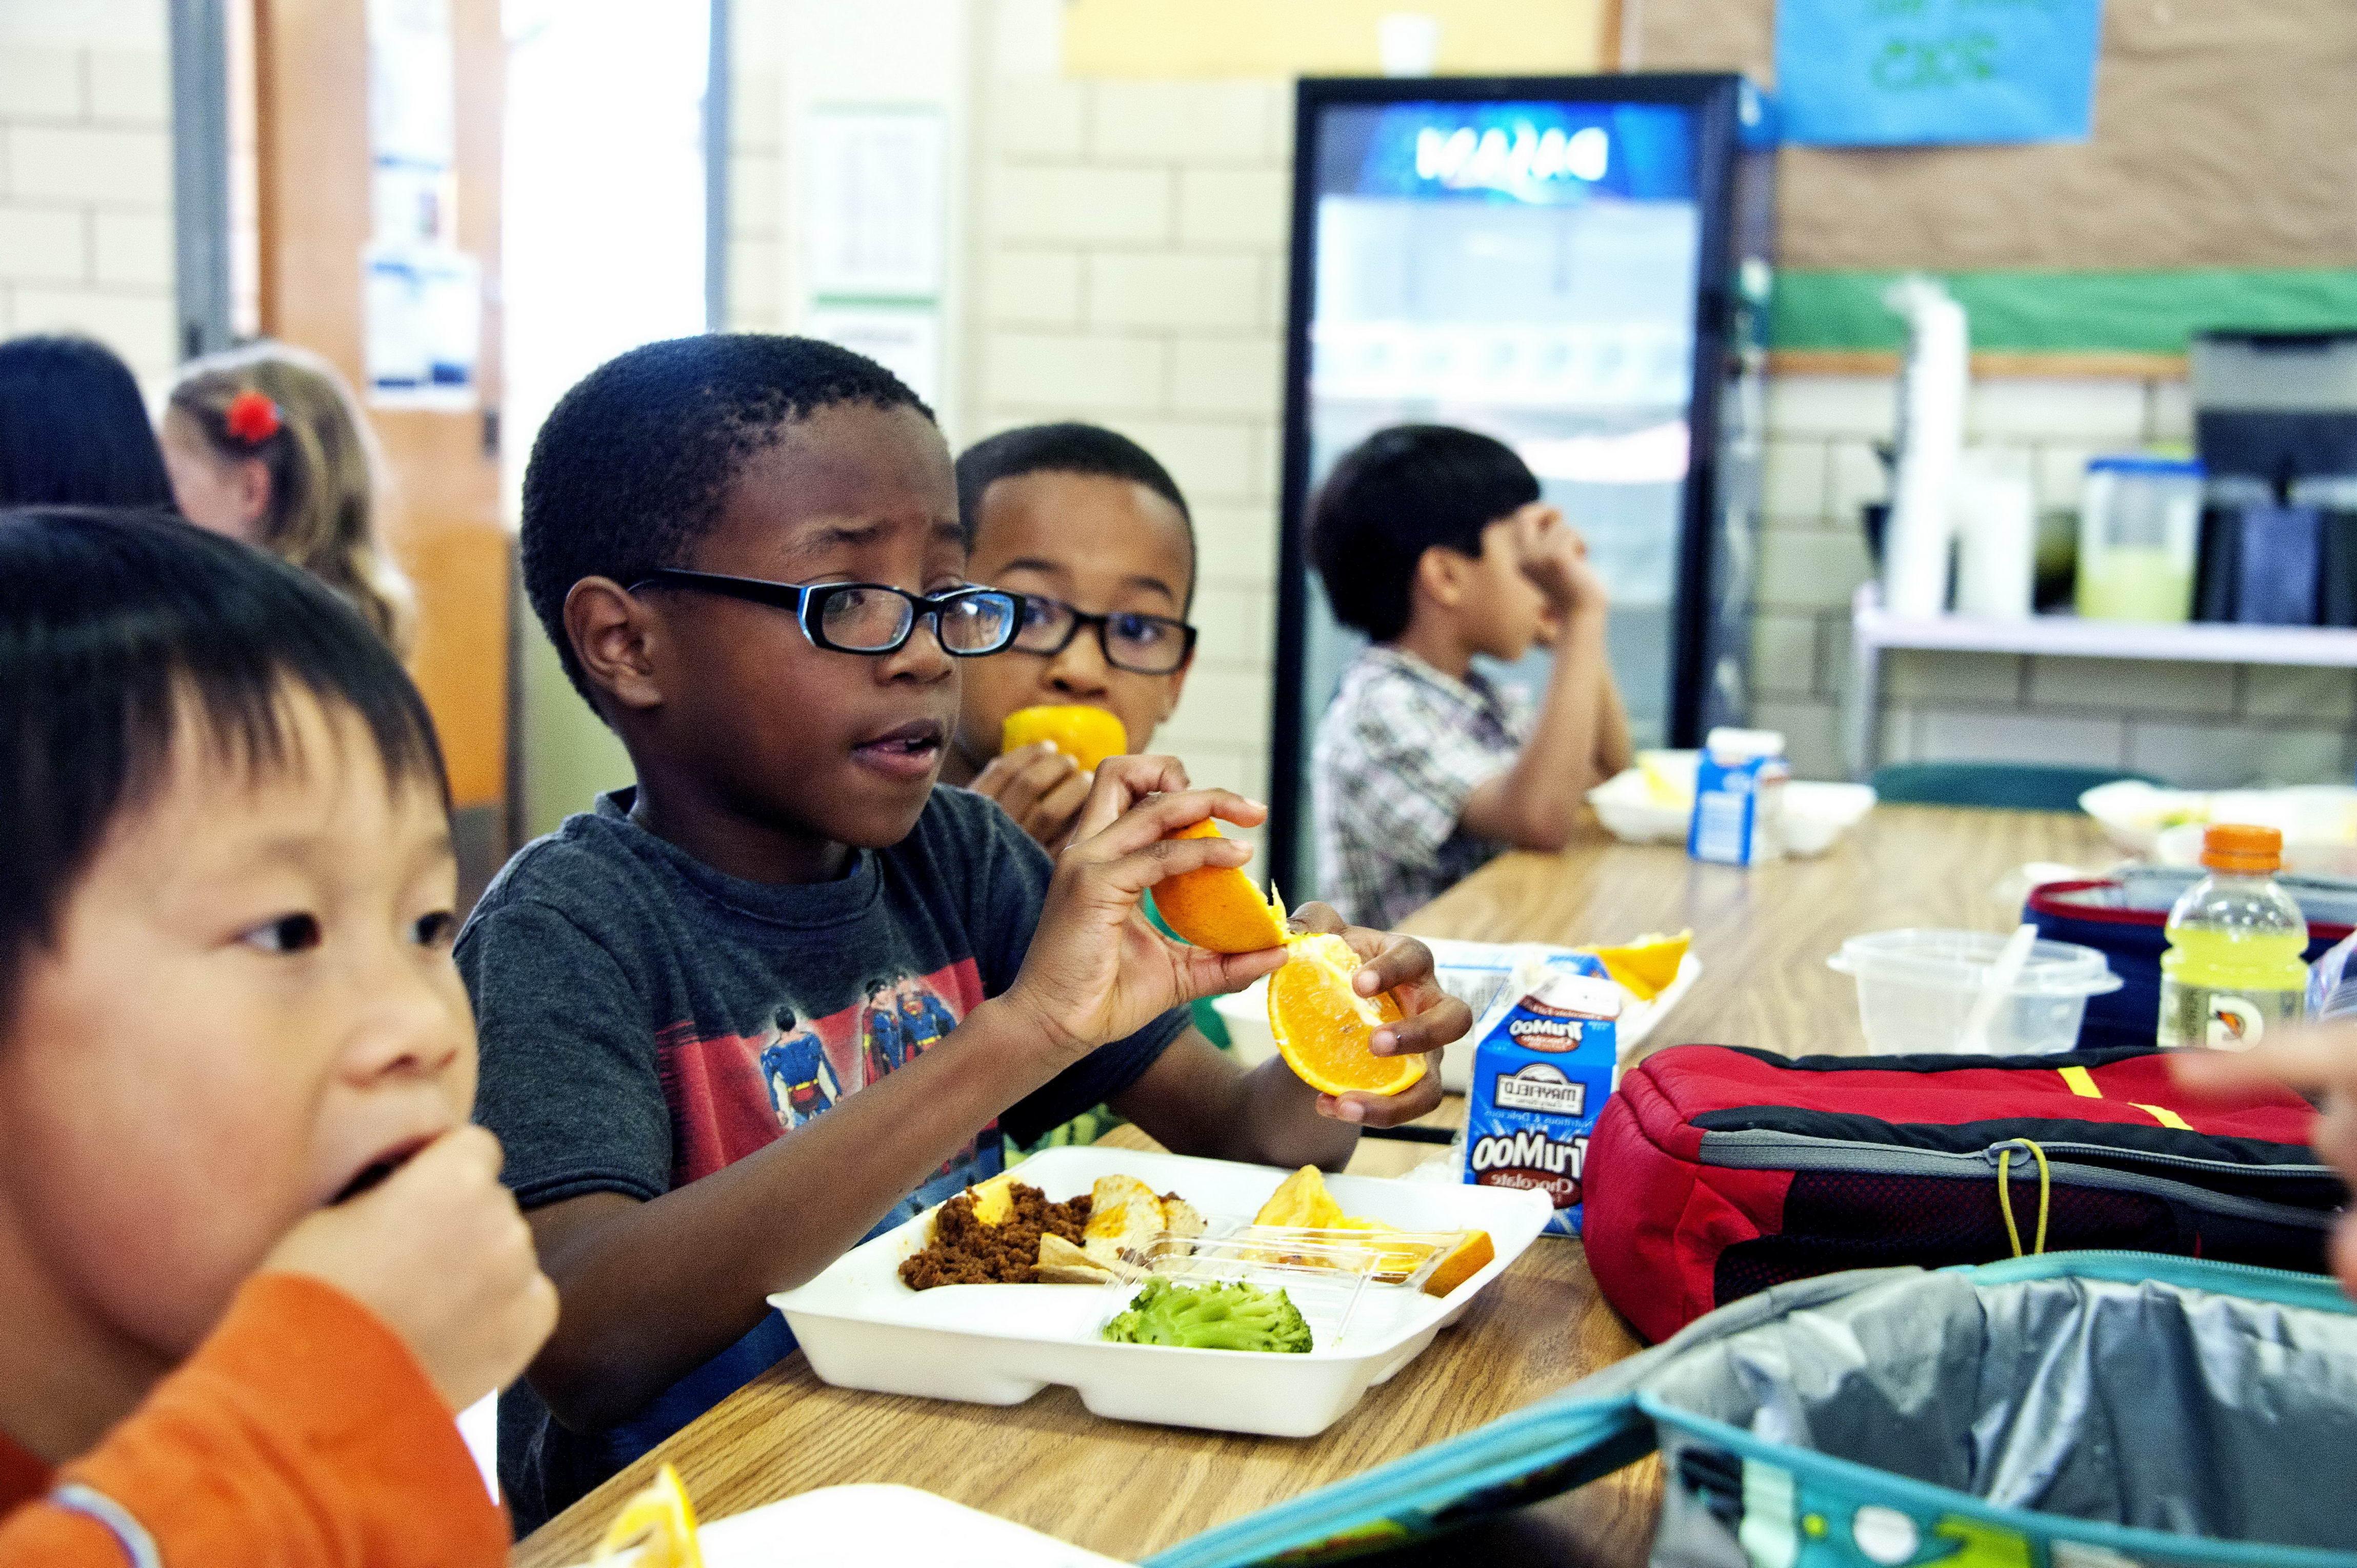 children eating lunch in school cafeteria